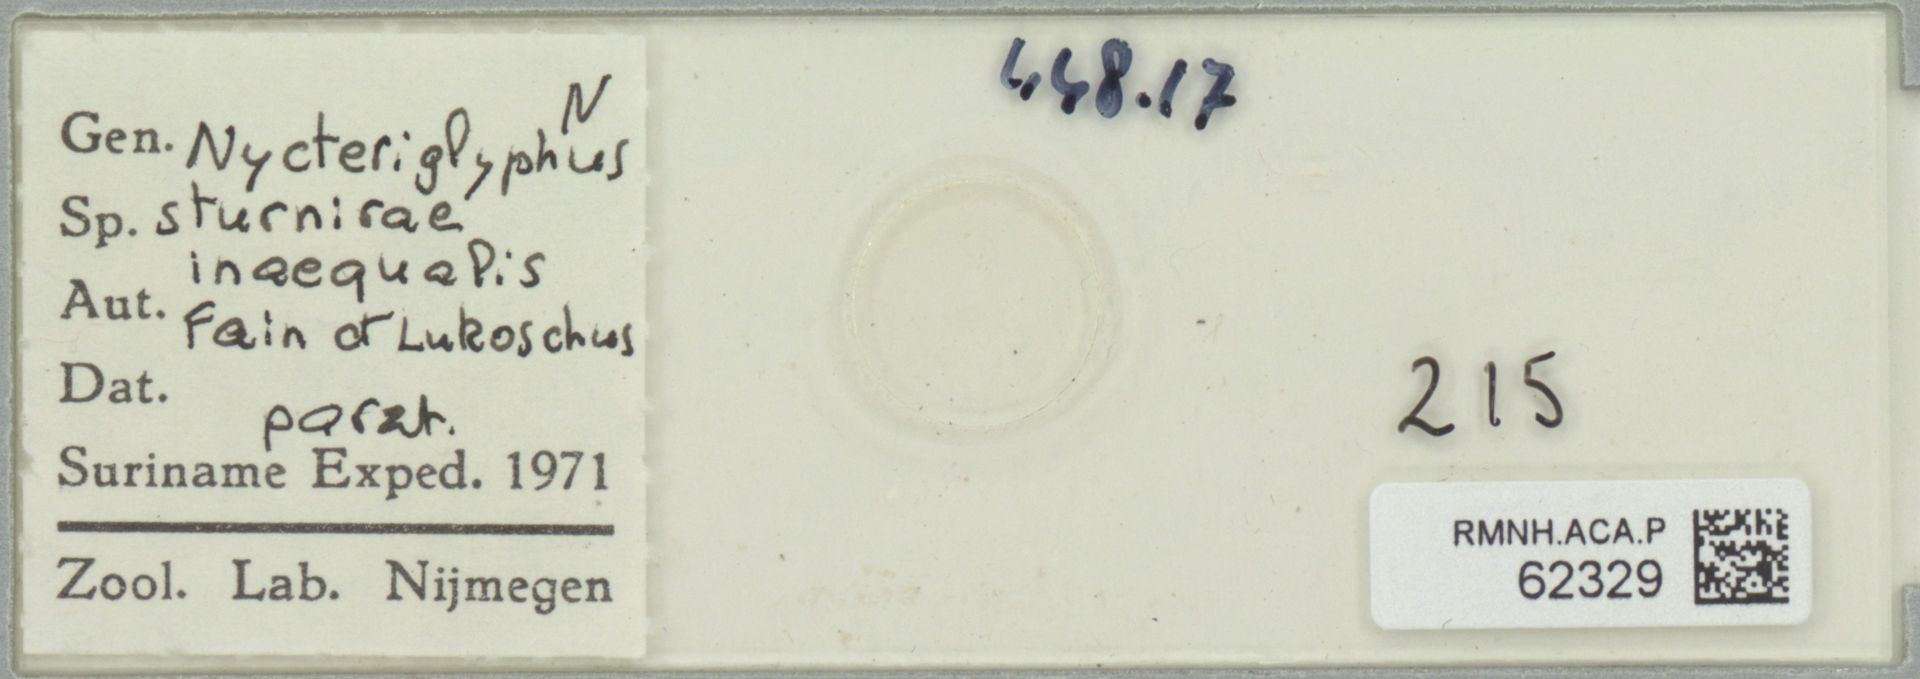 RMNH.ACA.P.62329 | Nycteriglyphus sturnirae inaequalis Fain et Lukoschus